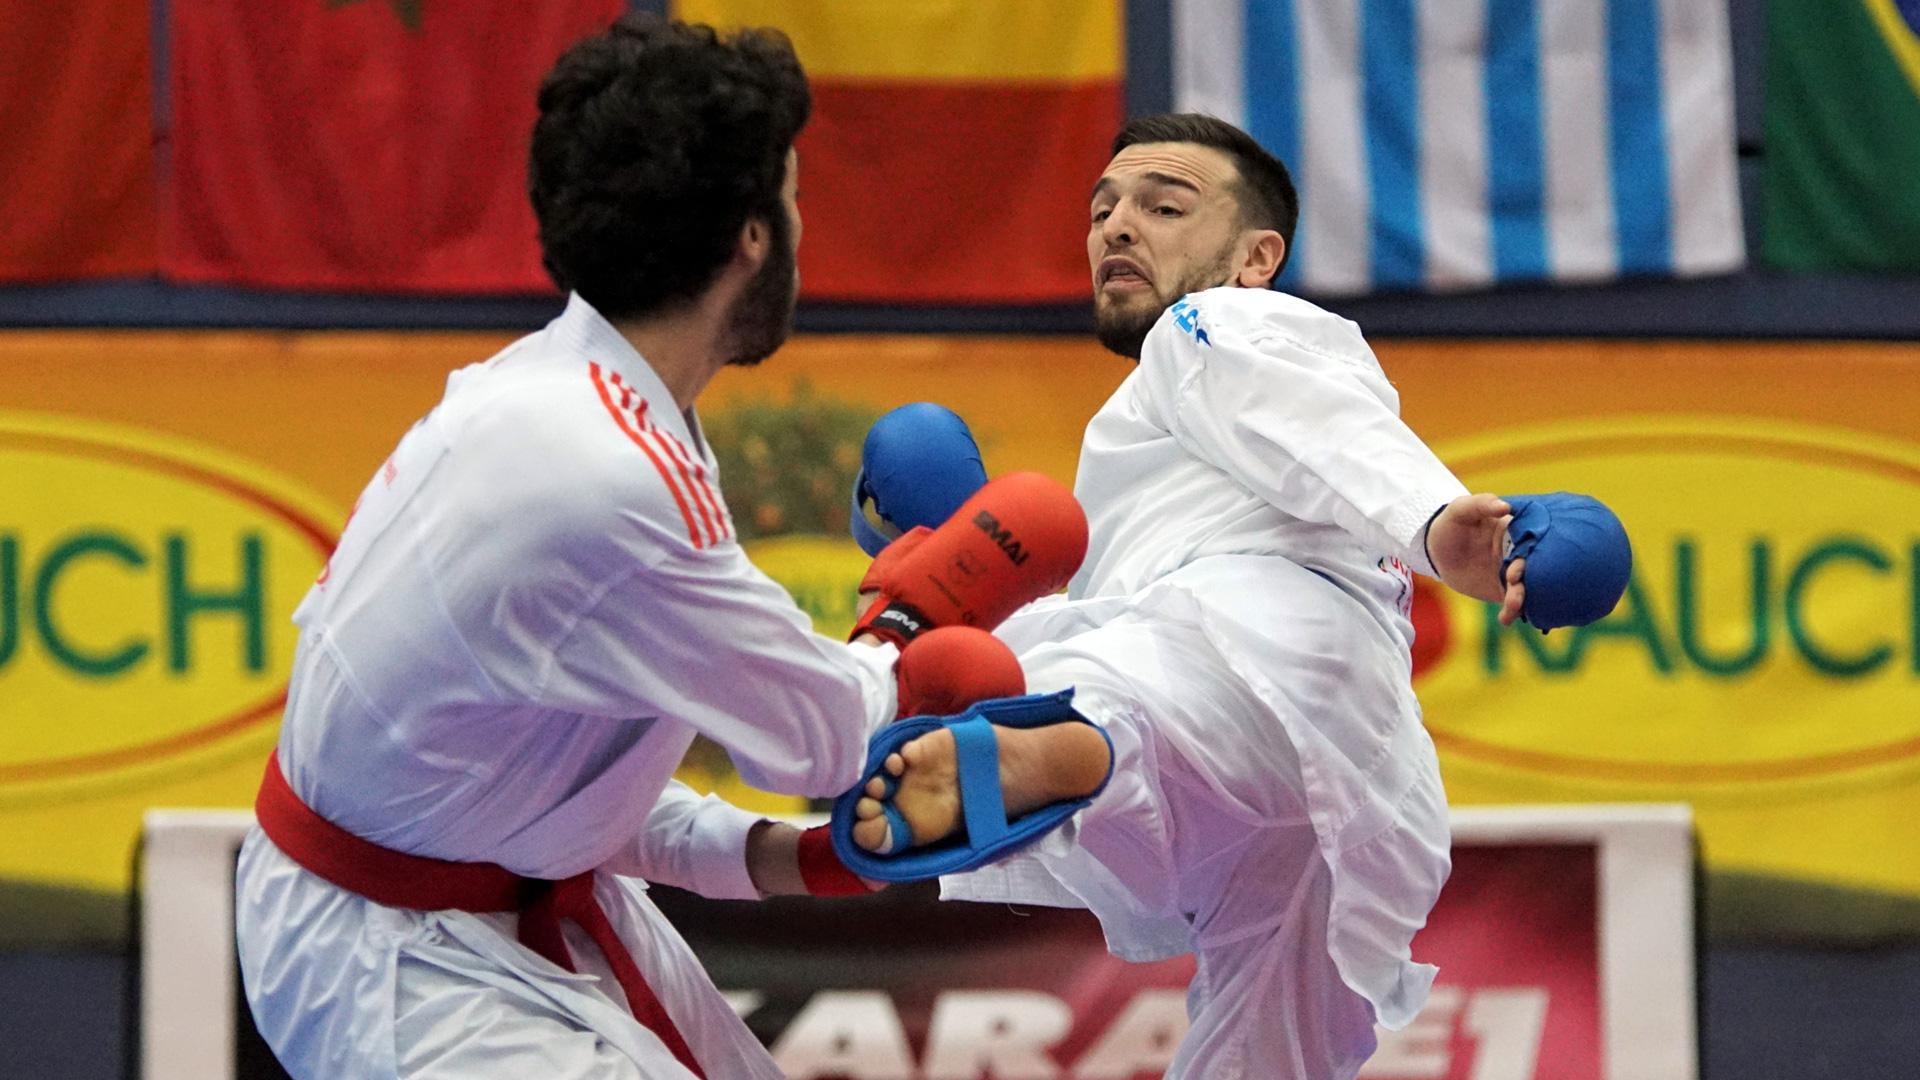 Stefan Pokorny | Bettina Plank | Austrian Open | Karate Austria | Platz 5 belegt